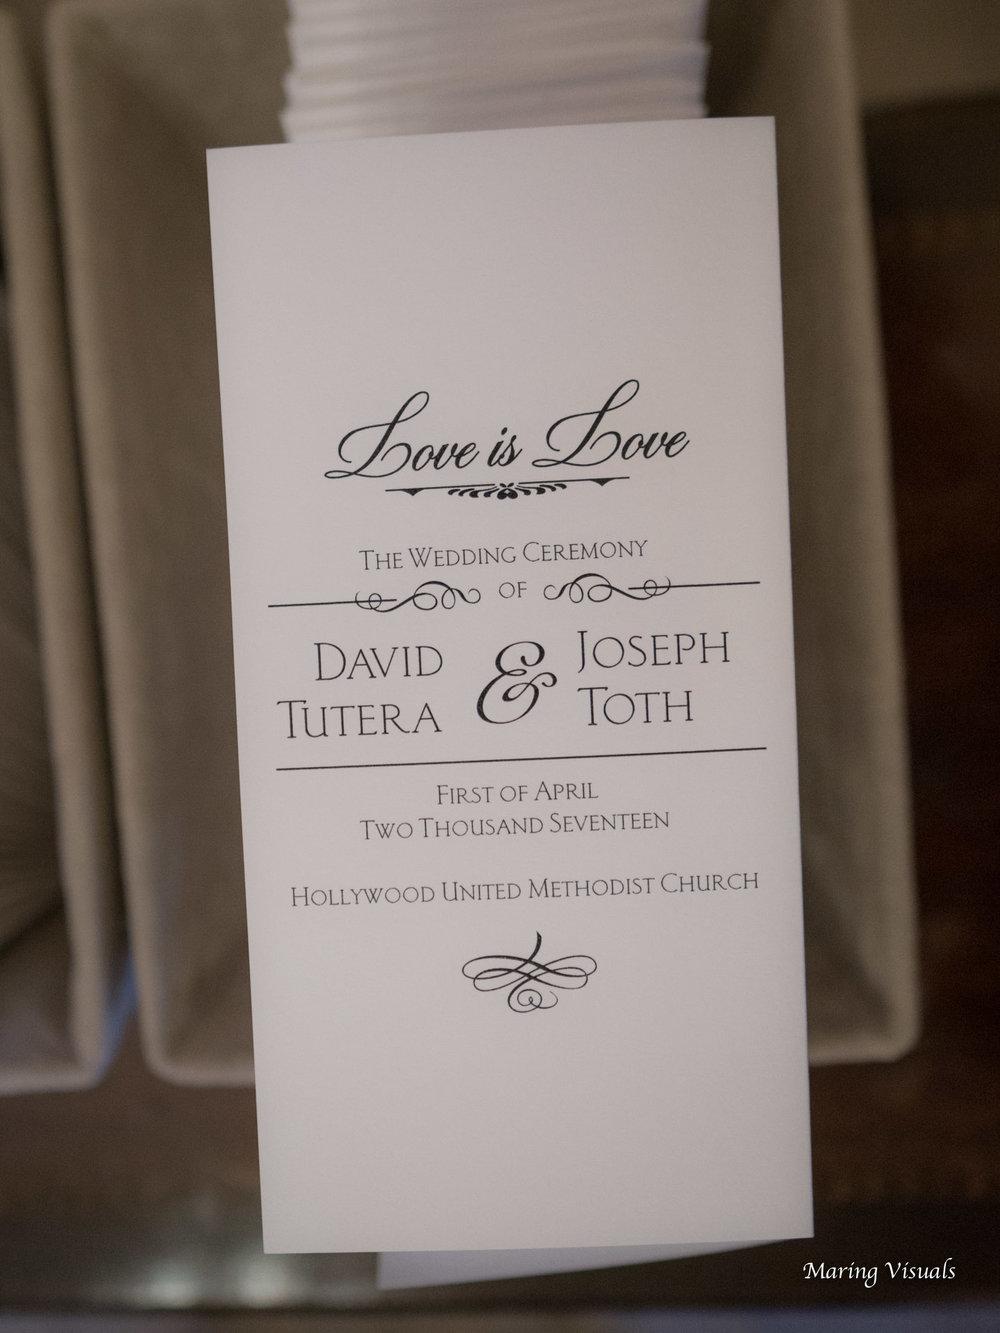 David Tutera Weddings by Maring Visuals 00513.jpg